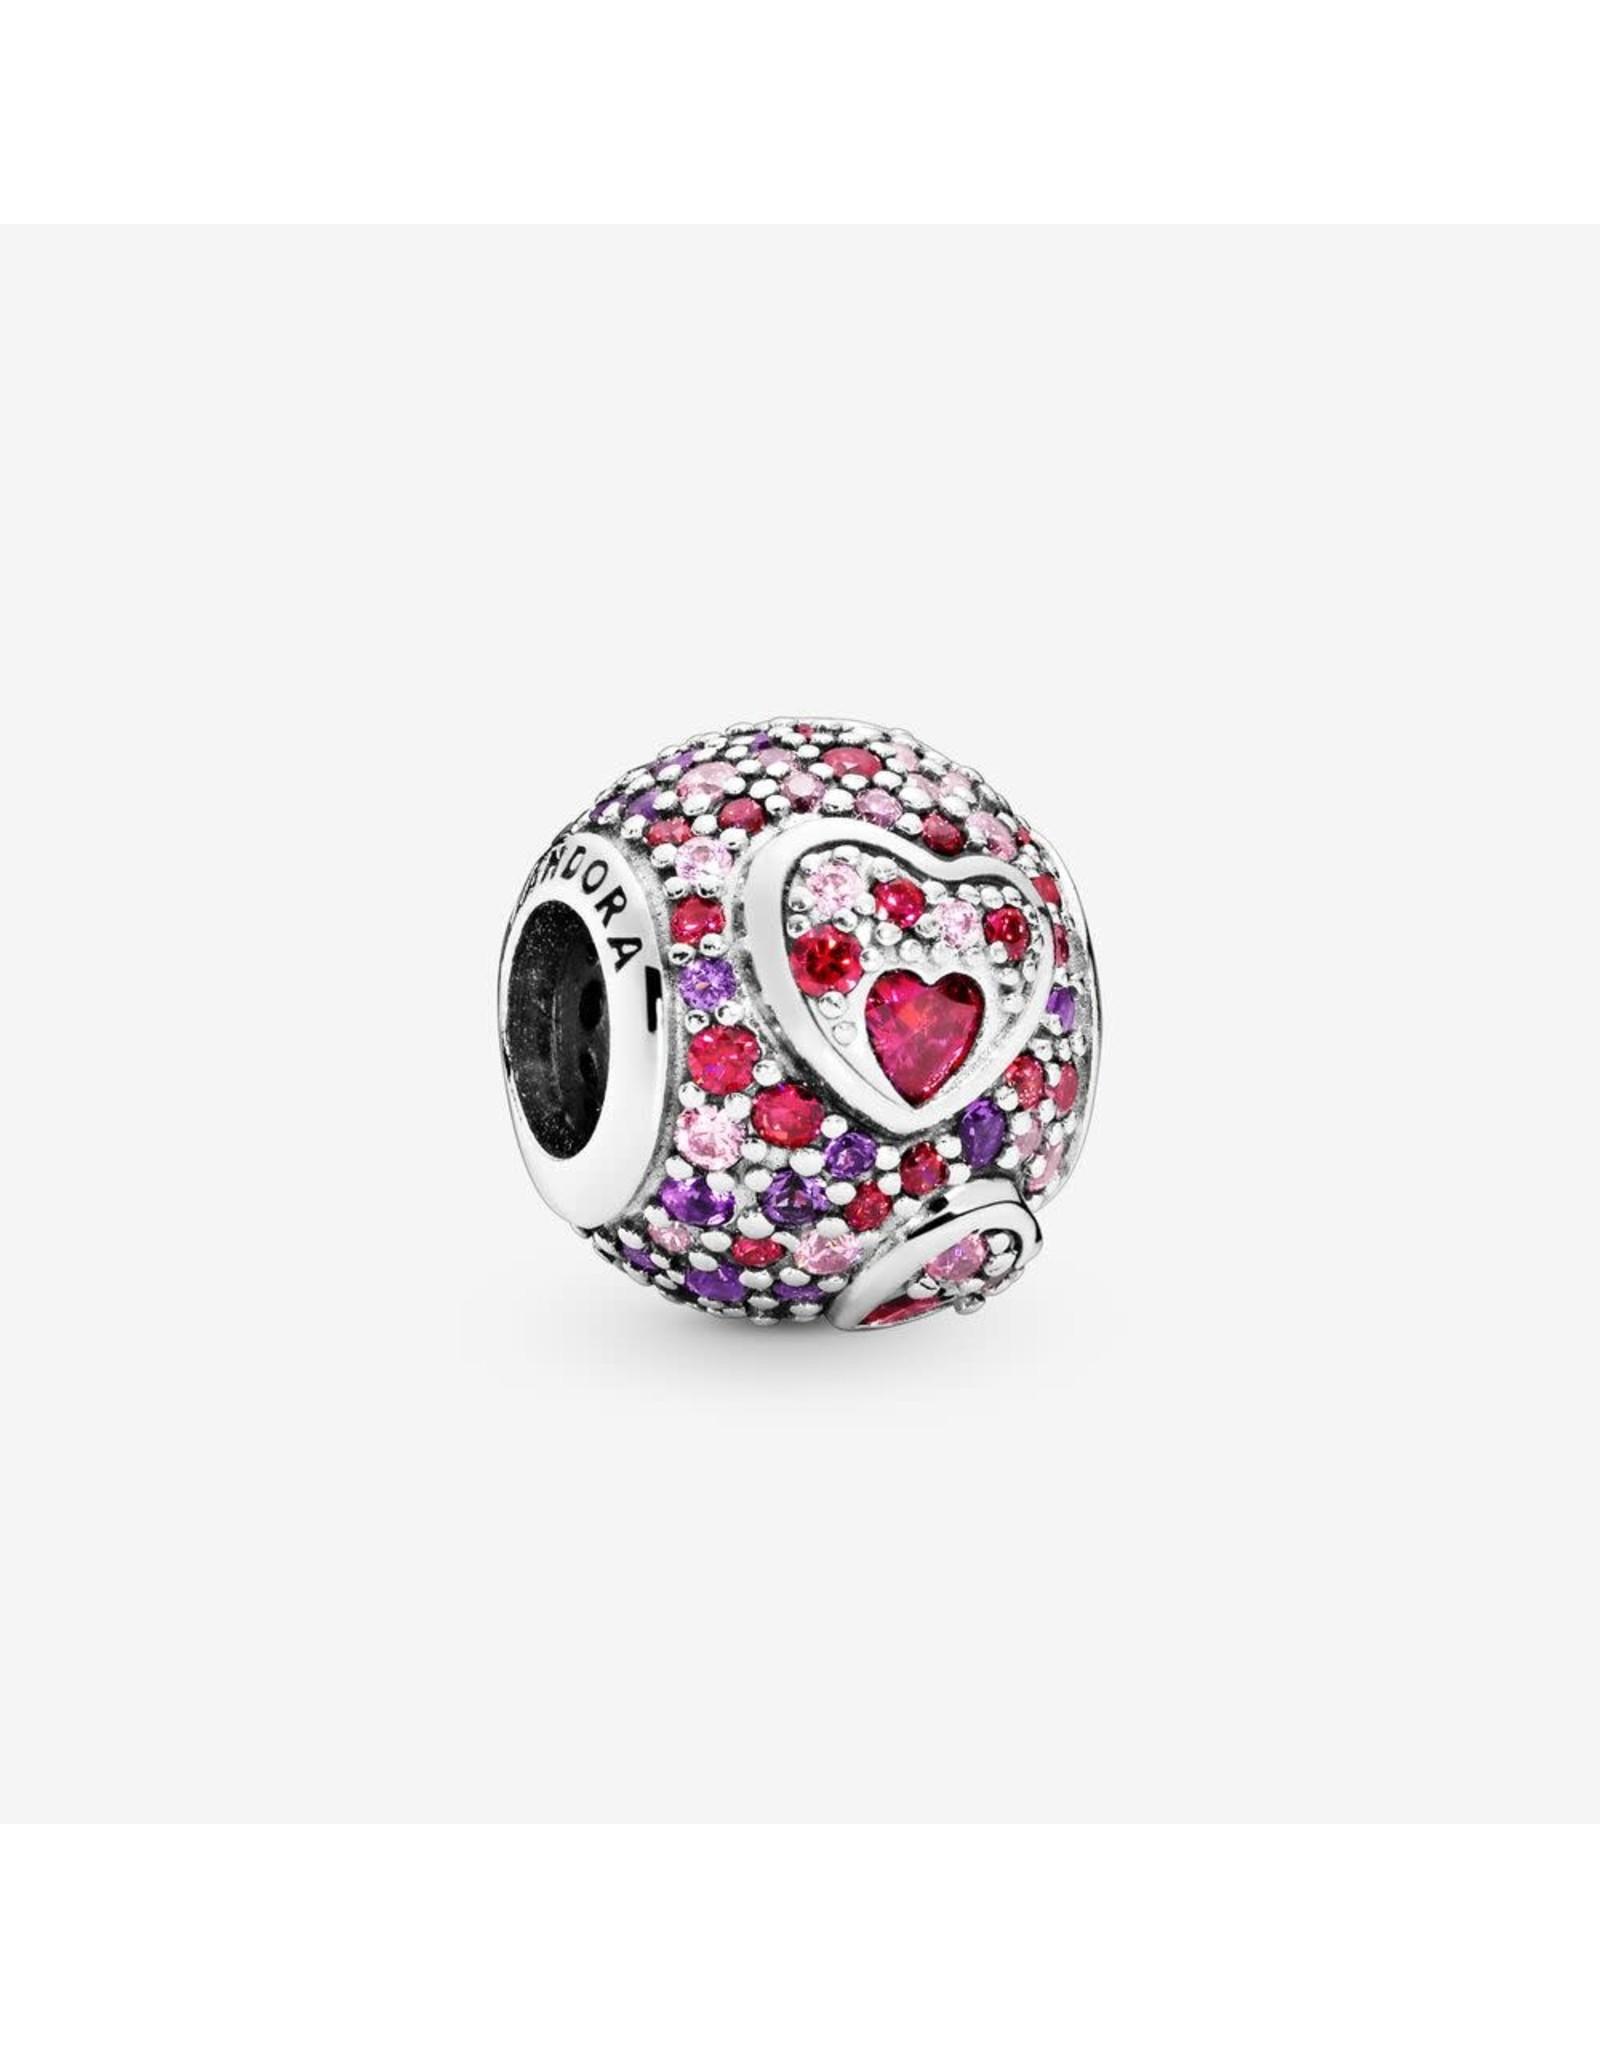 Pandora Pandora Charm Asymetric Hearts of Love, Red & Pink CZ, Royal Purple Crystals